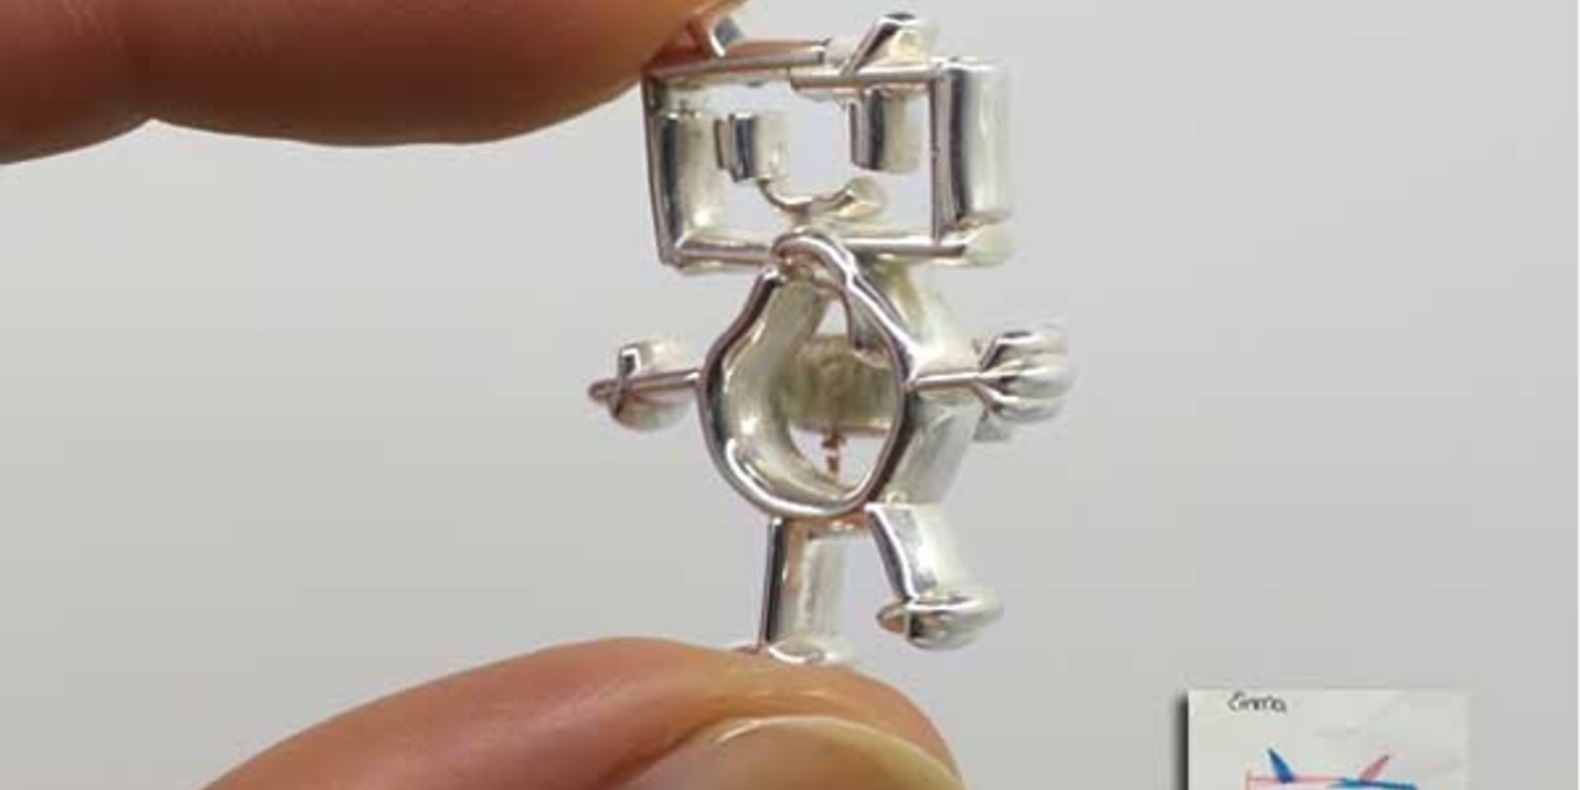 cults dessin enfant ucki impression 3D fichier 3D metal bijoux imprimés en 3D kid 9